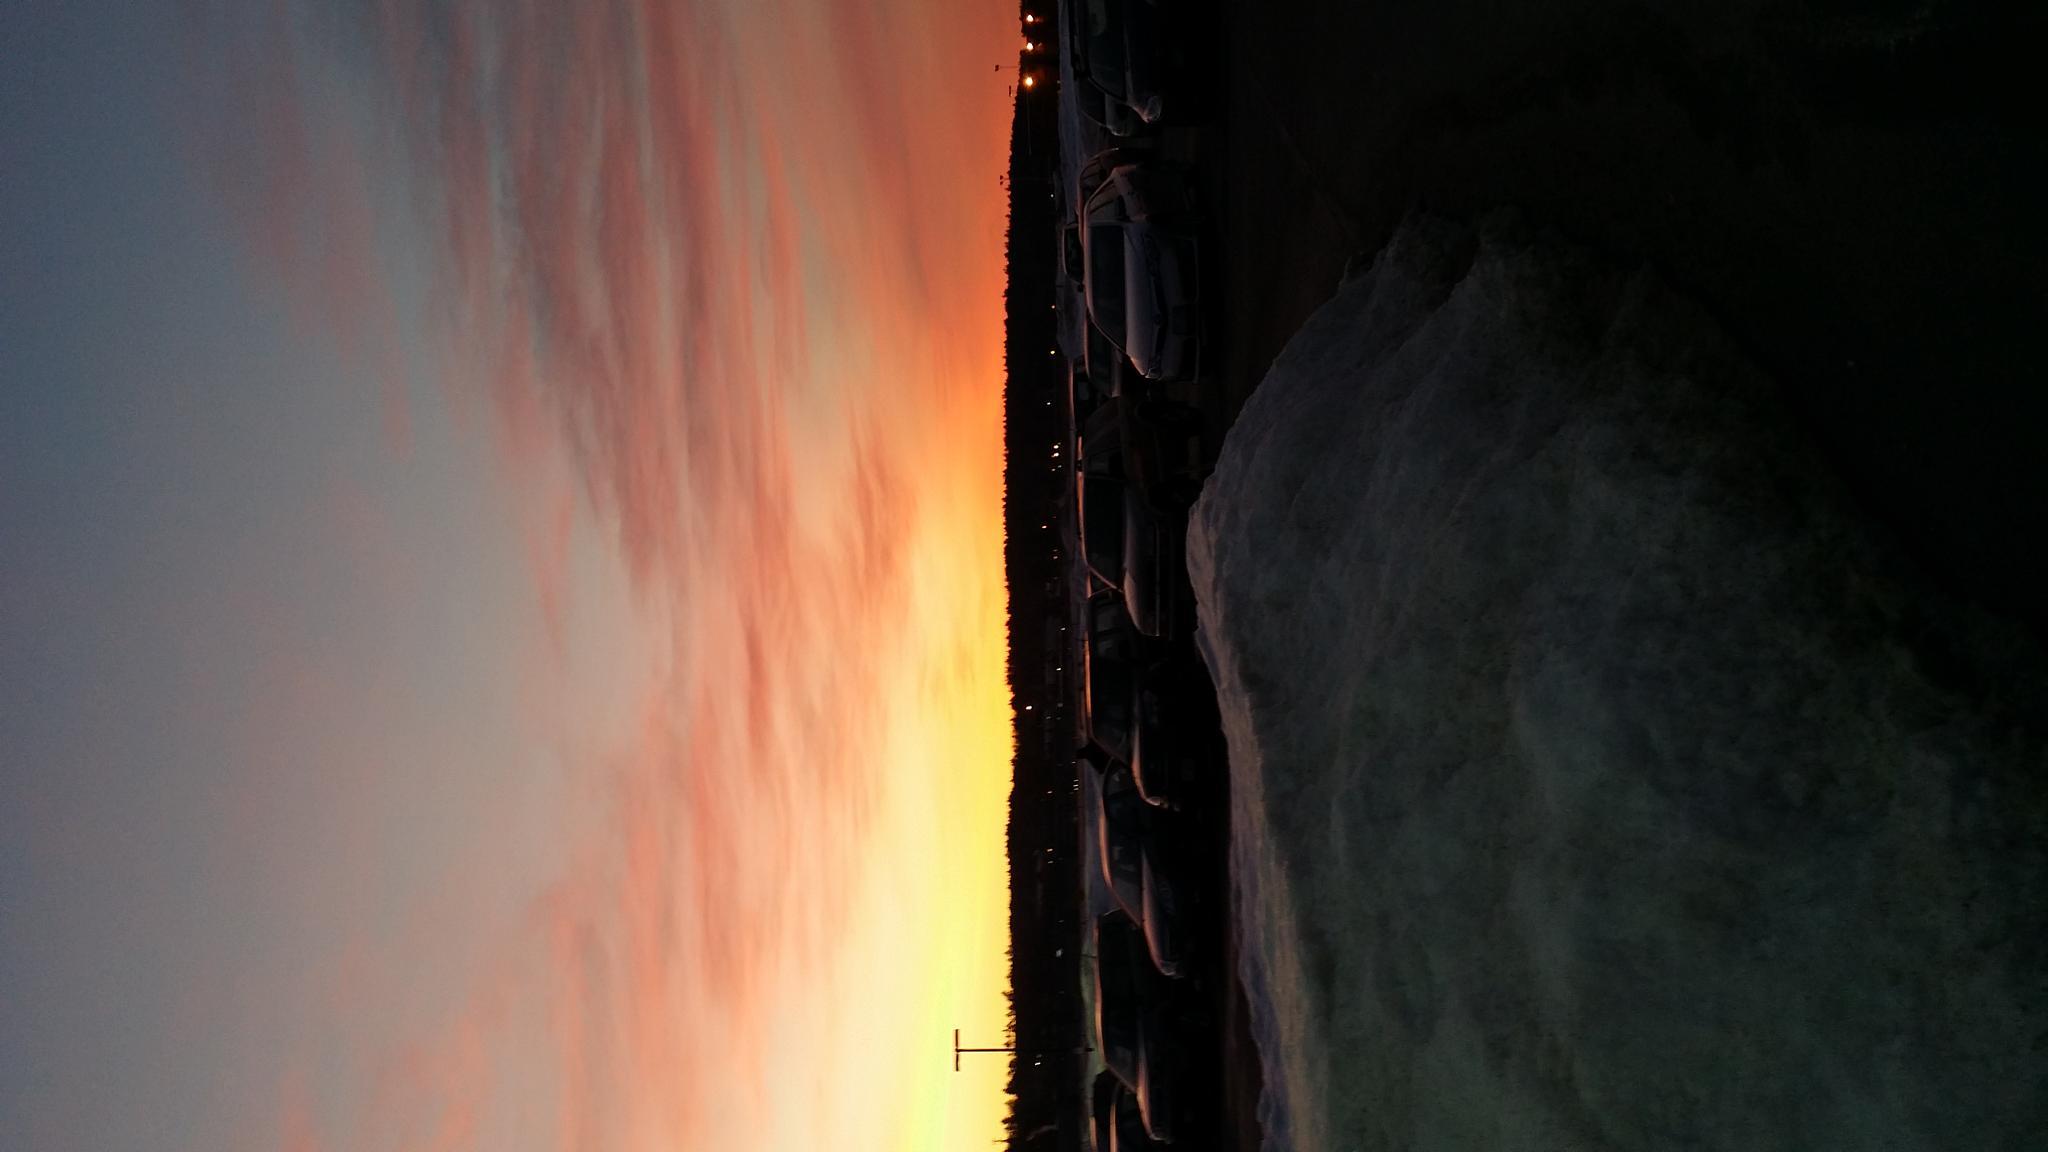 Airport Sunrise by michael.noyer.792